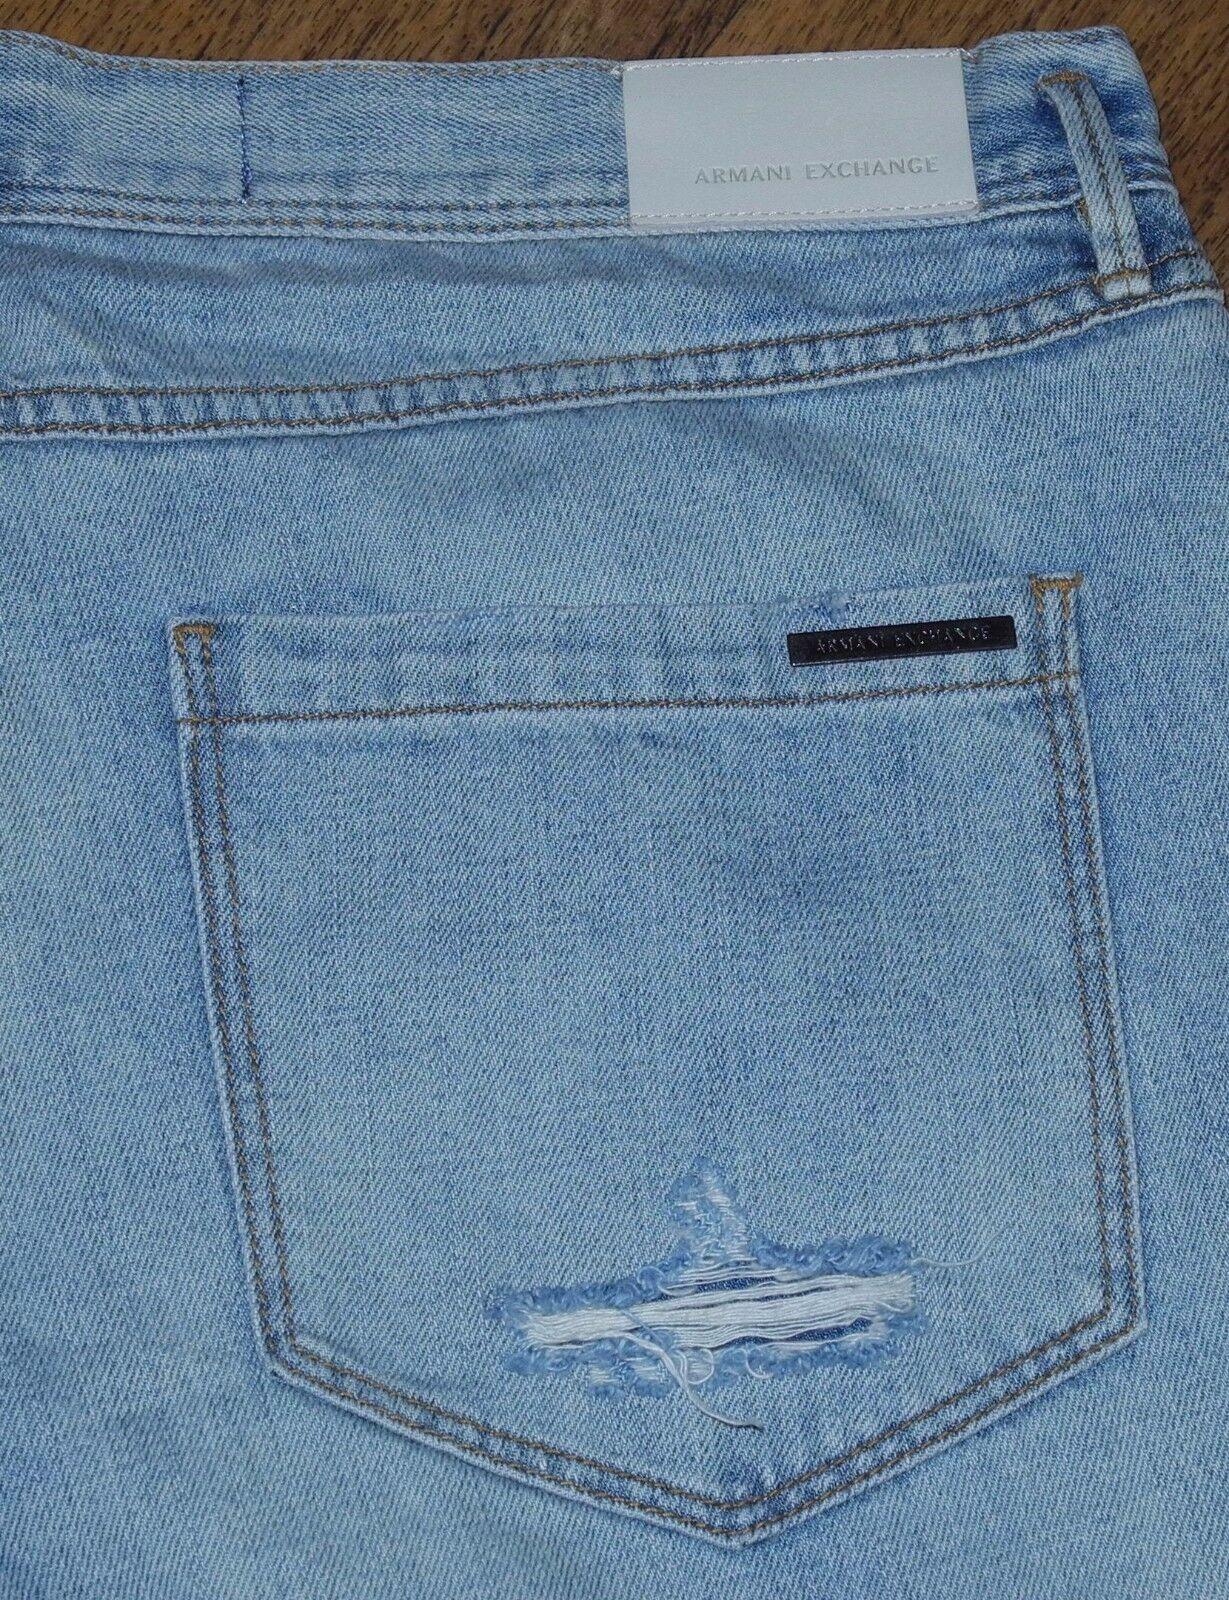 NEW A X ARMANI EXCHANGE Boyfriend Fit Women's Destroyed bluee Jeans Size 31